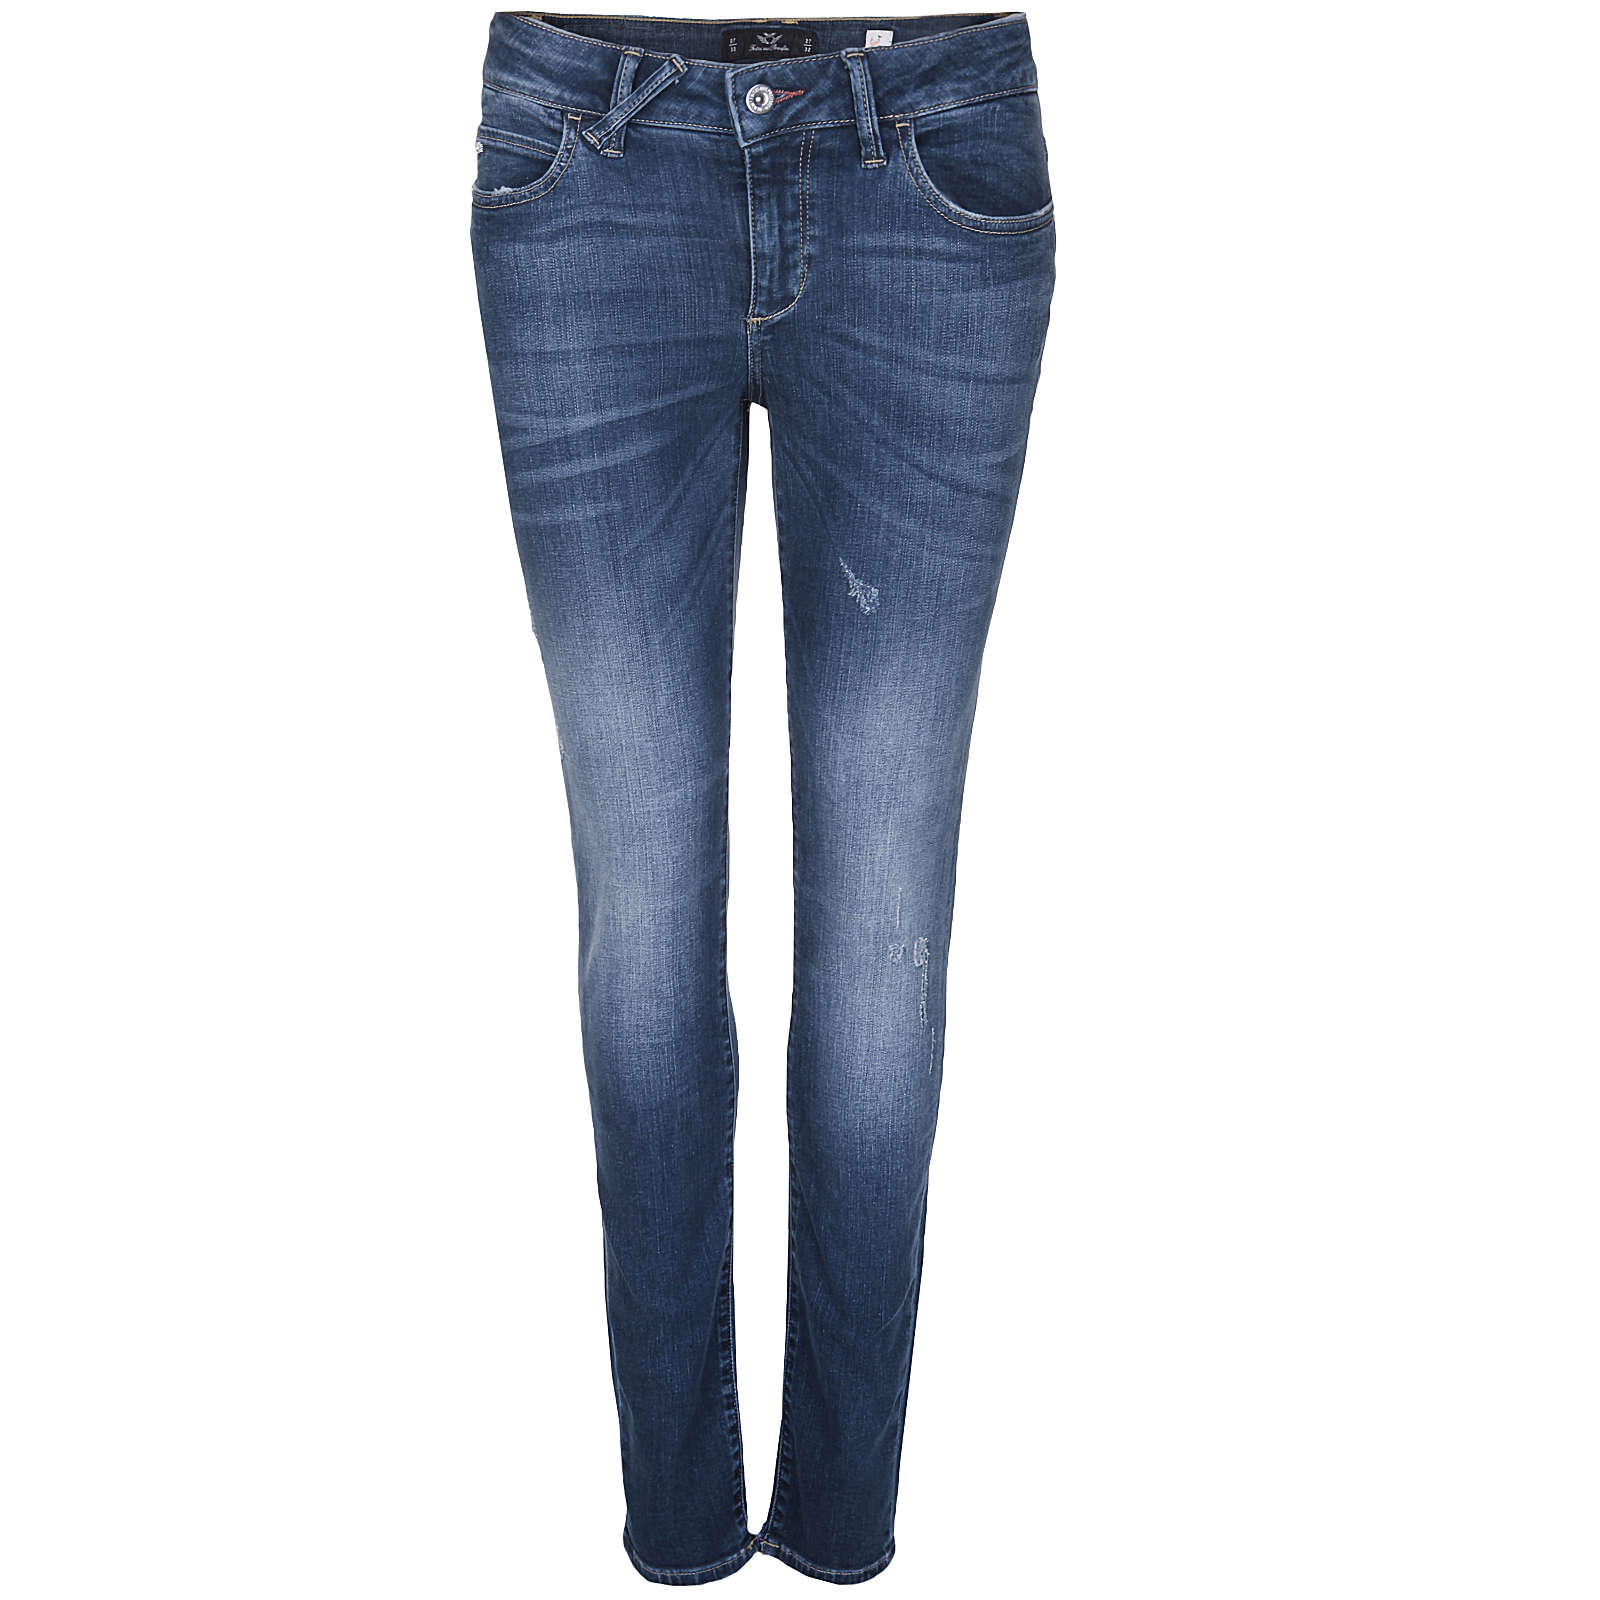 Fritzi aus Preußen JEANS HOSE INDIANA STRAIGHT LEG Jeanshosen blau Damen Gr. 32/L30